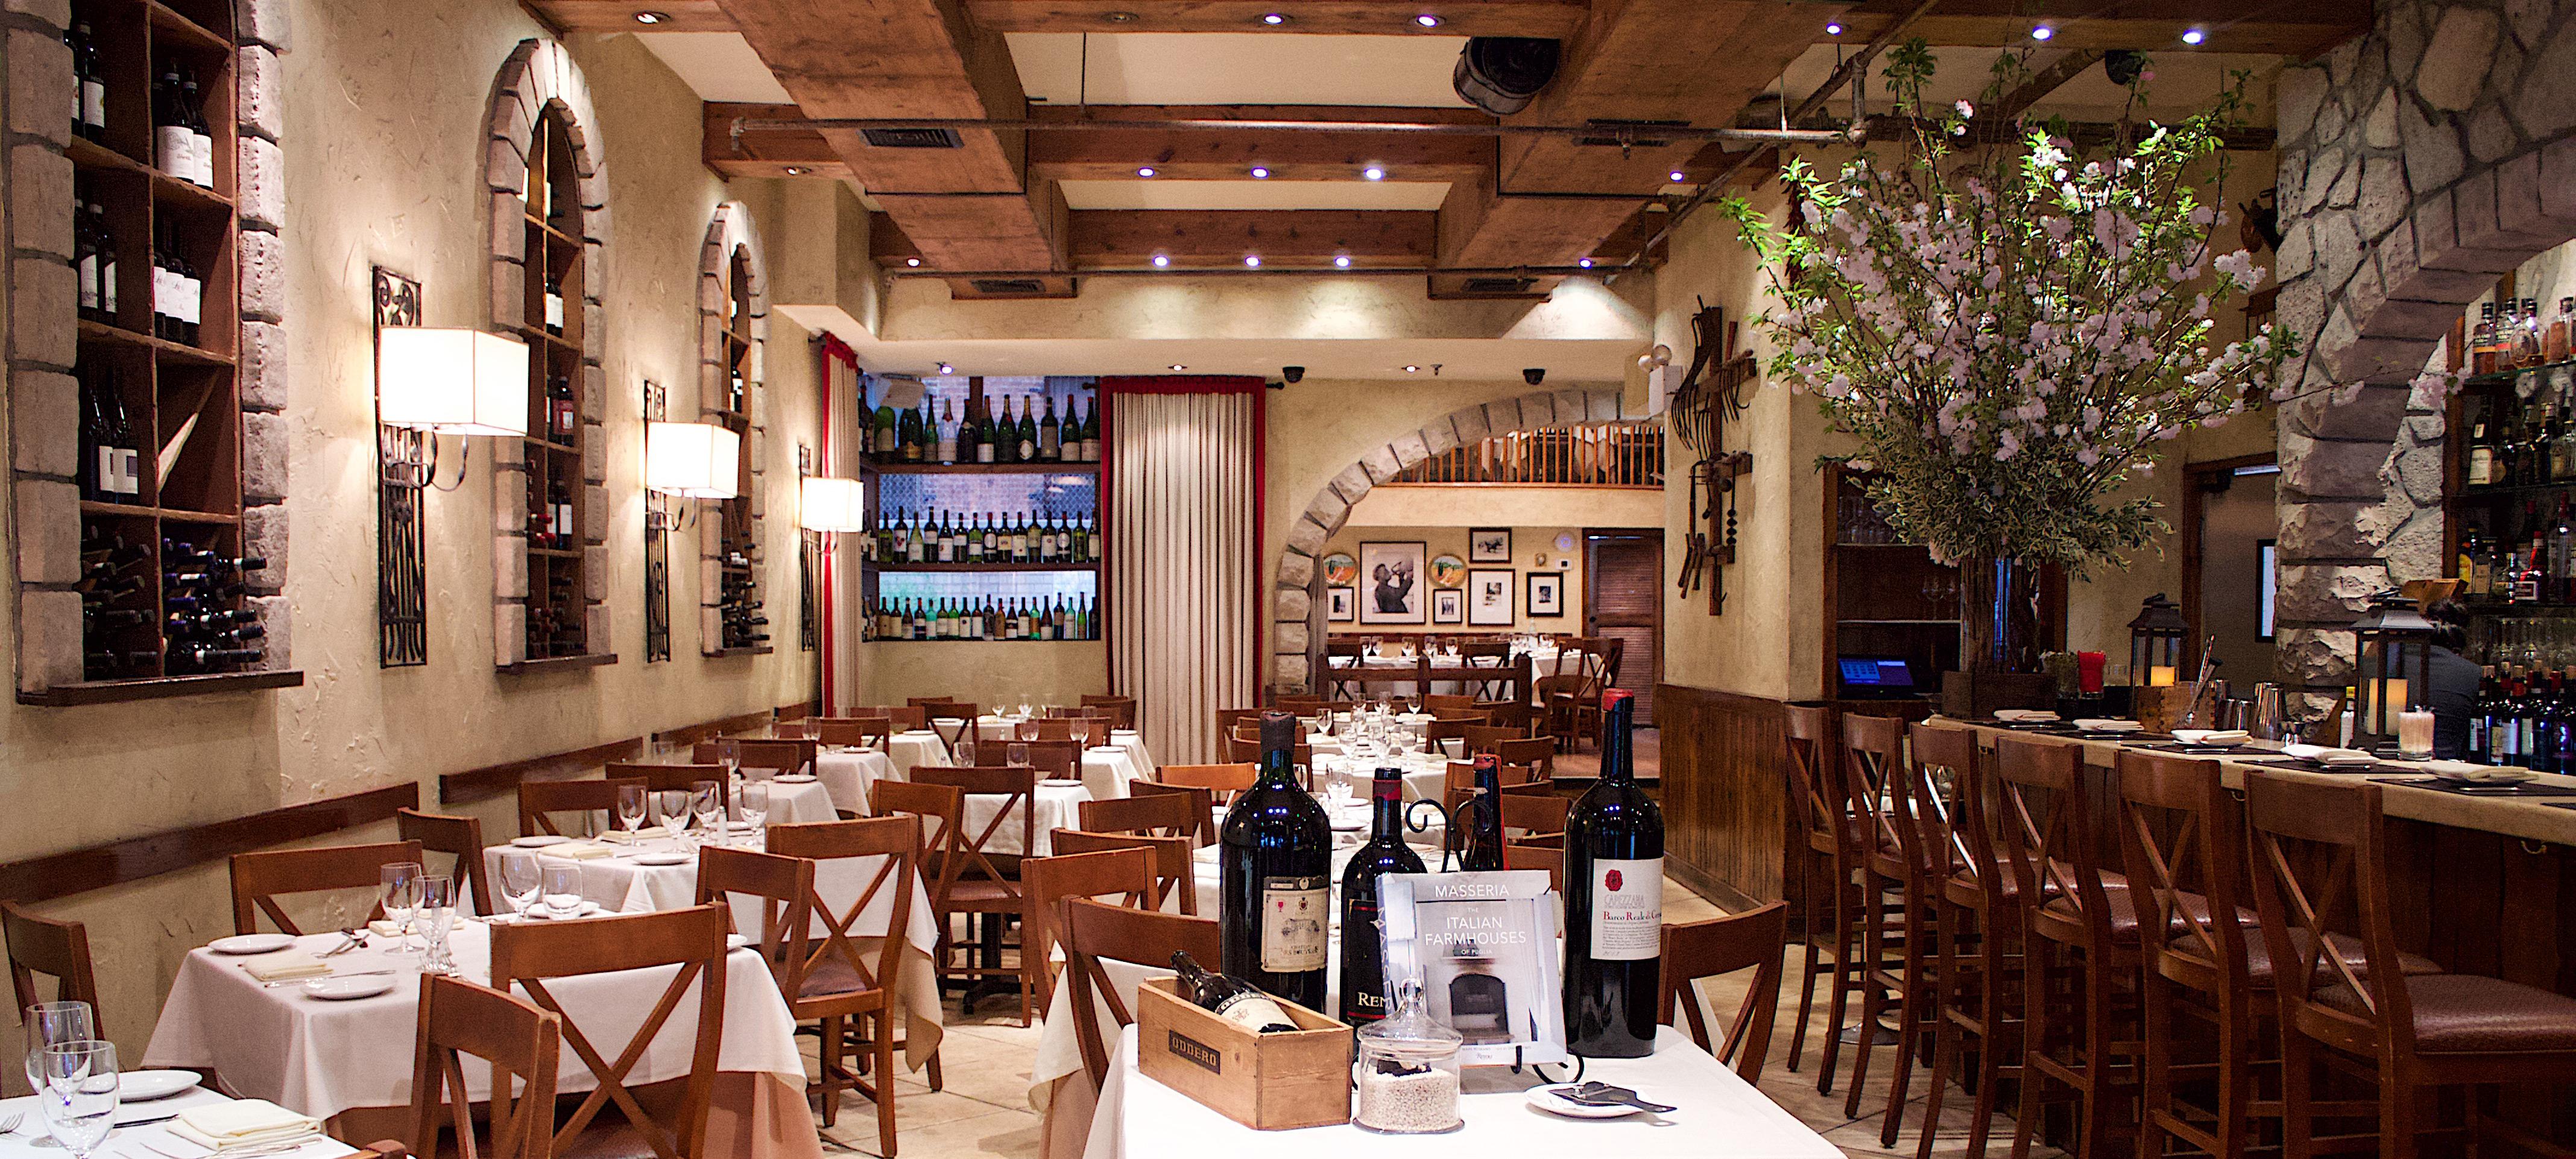 La Masseria New York City Authentic Italian Cuisine